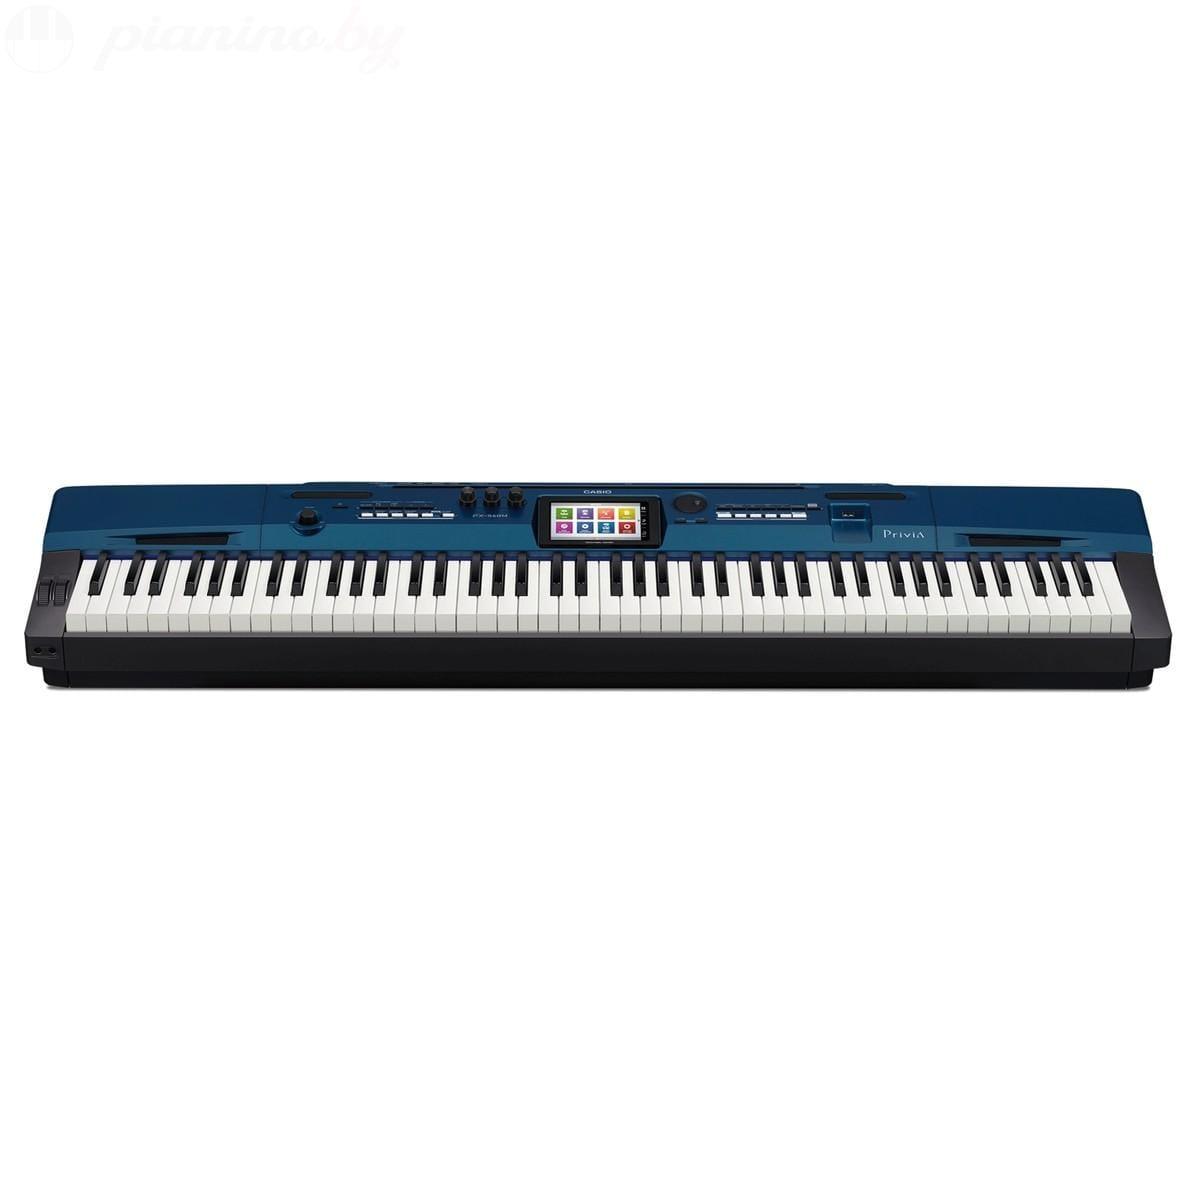 Цифровое пианино Casio Privia PX-560M Blue Фото 2